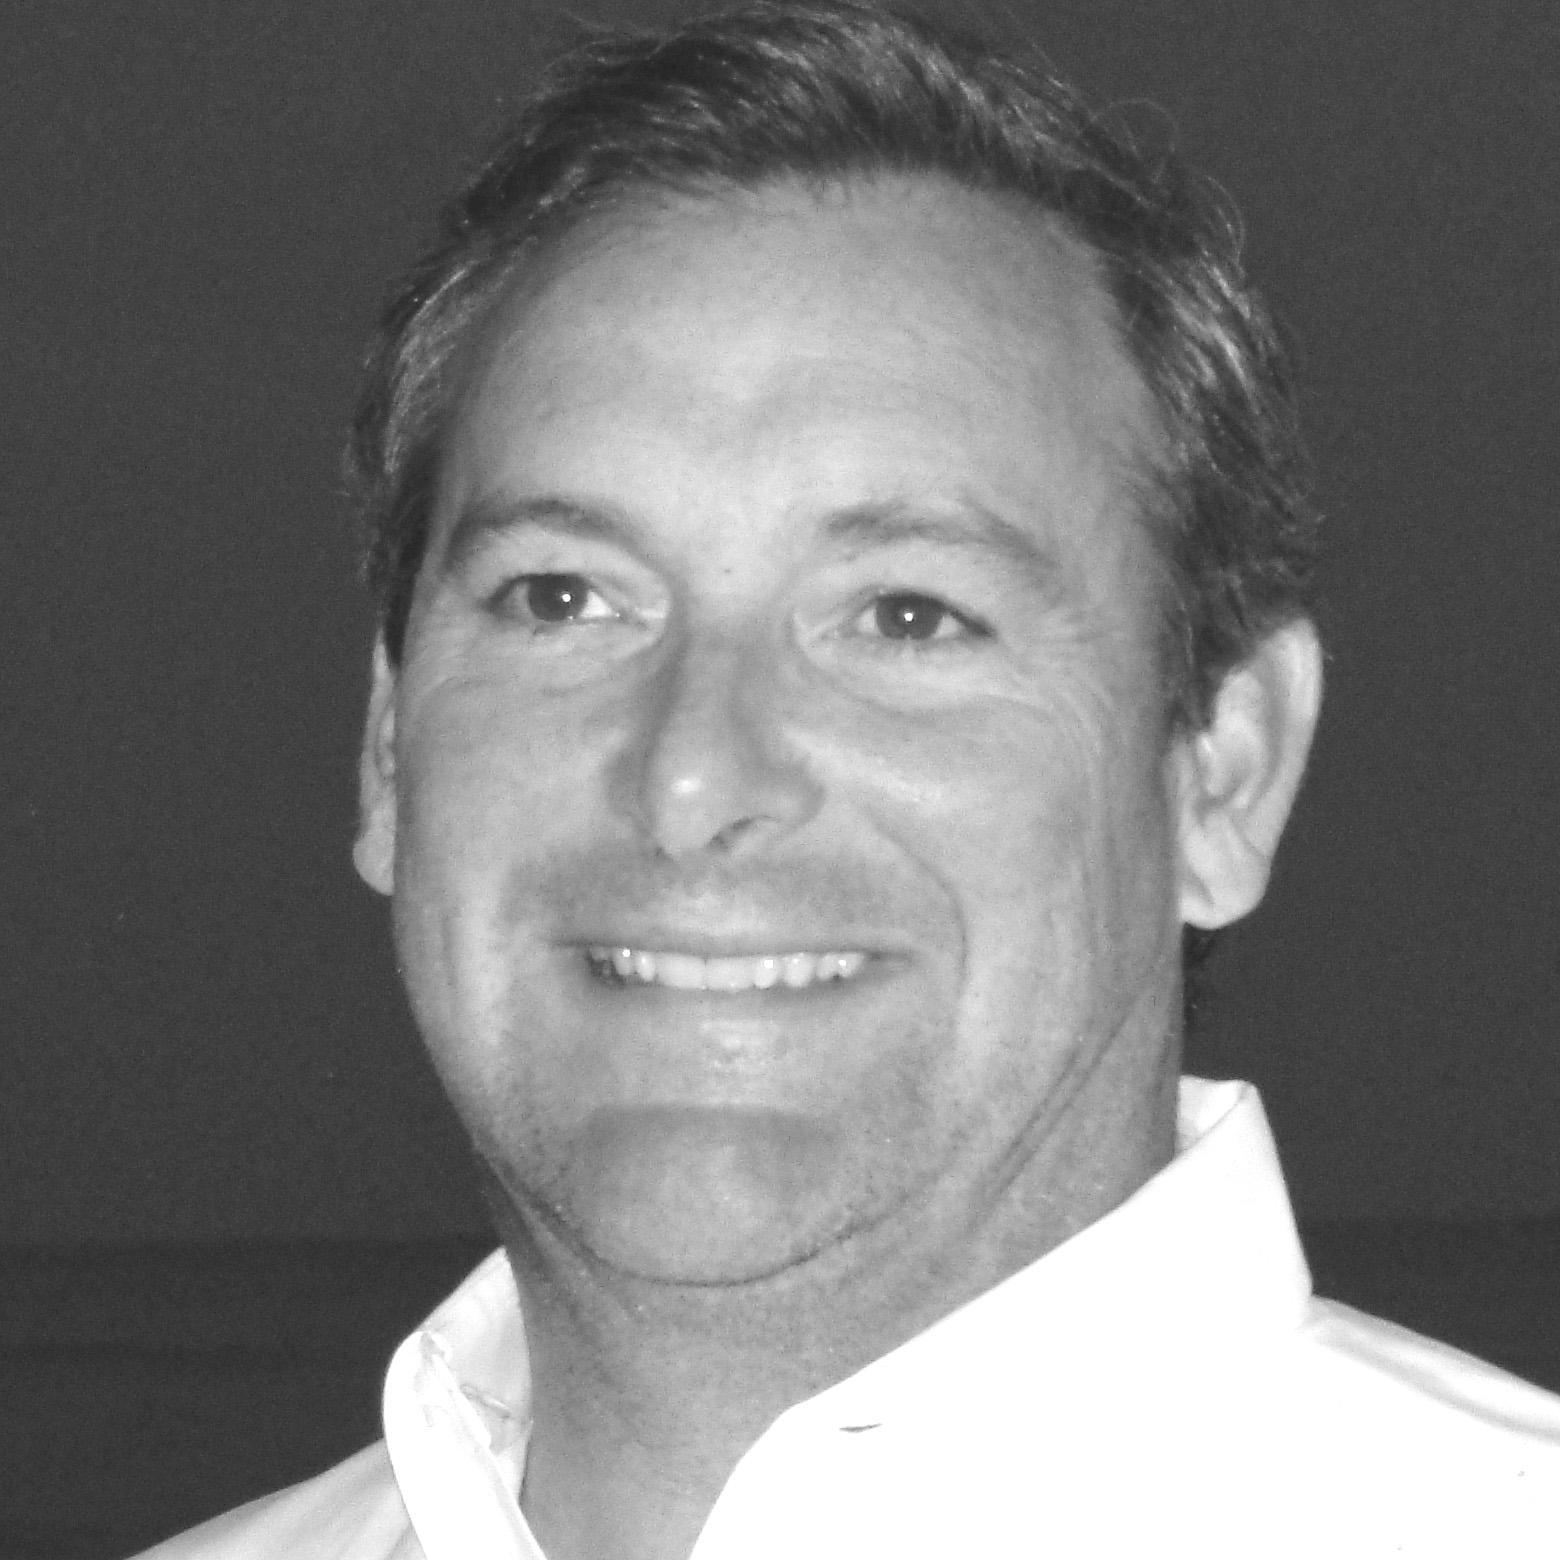 Joseph McErlean Profile Photo